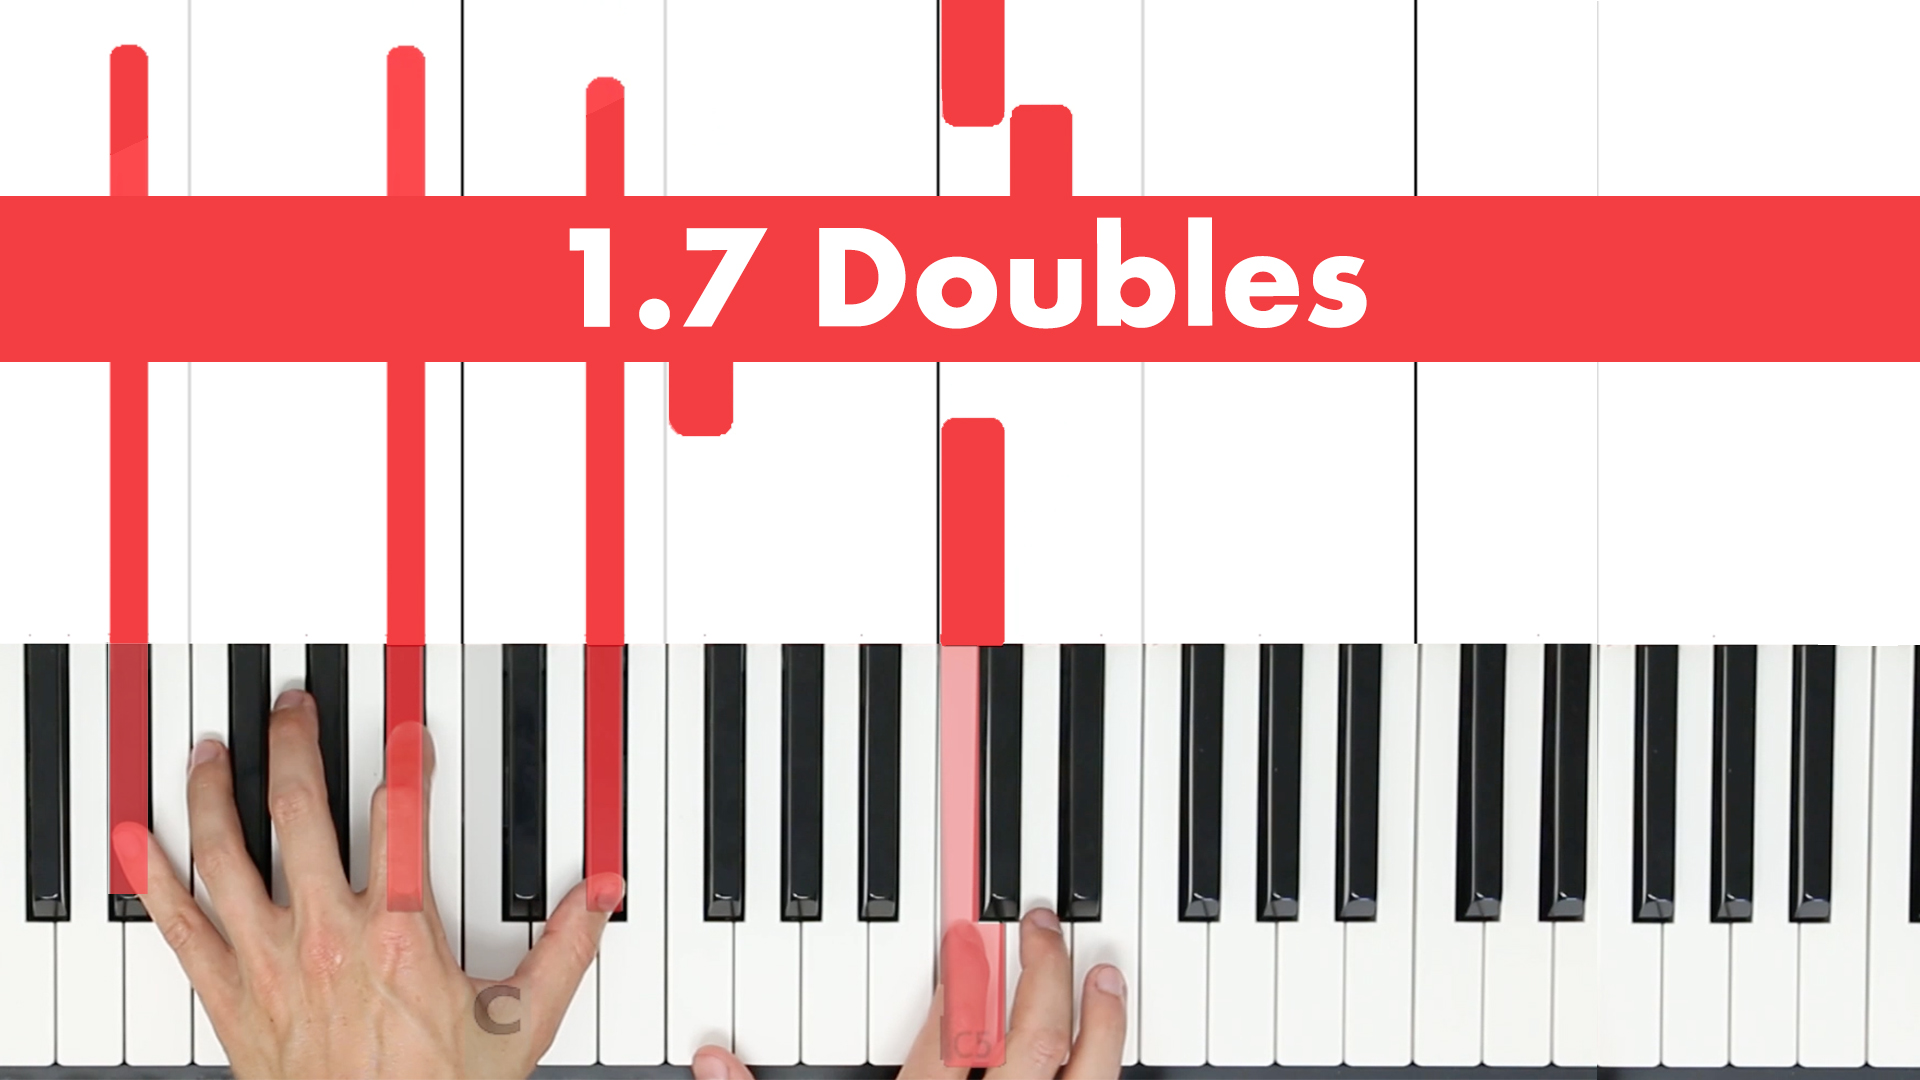 1.7 Doubles